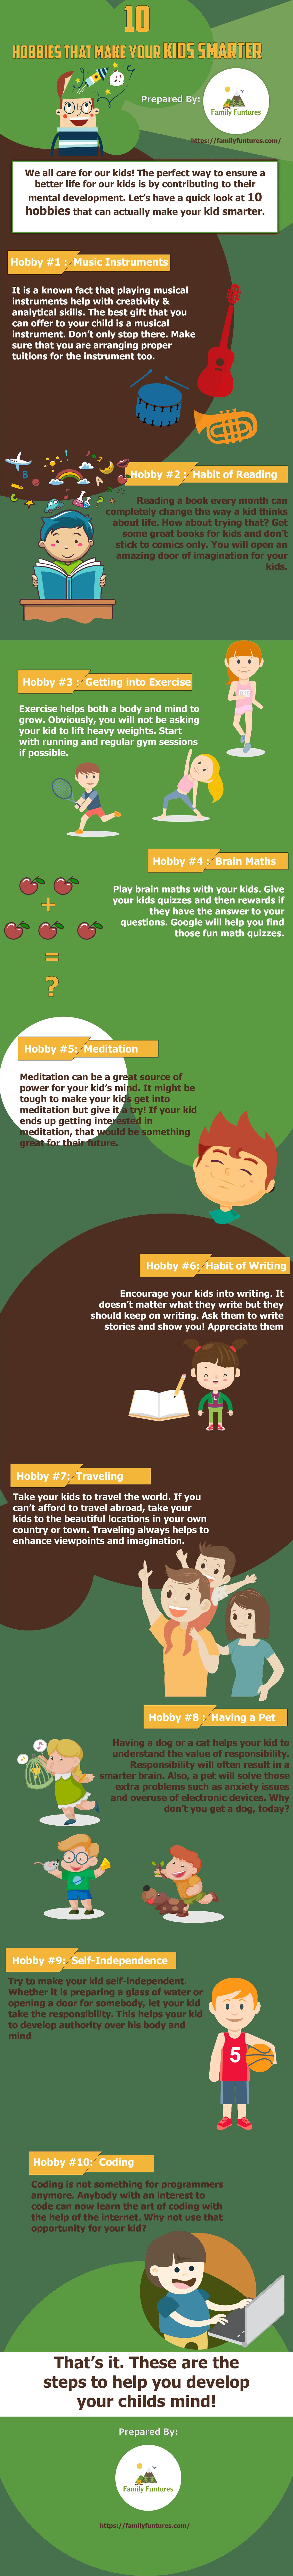 10 Hobbies that Make Your Kids Smarter